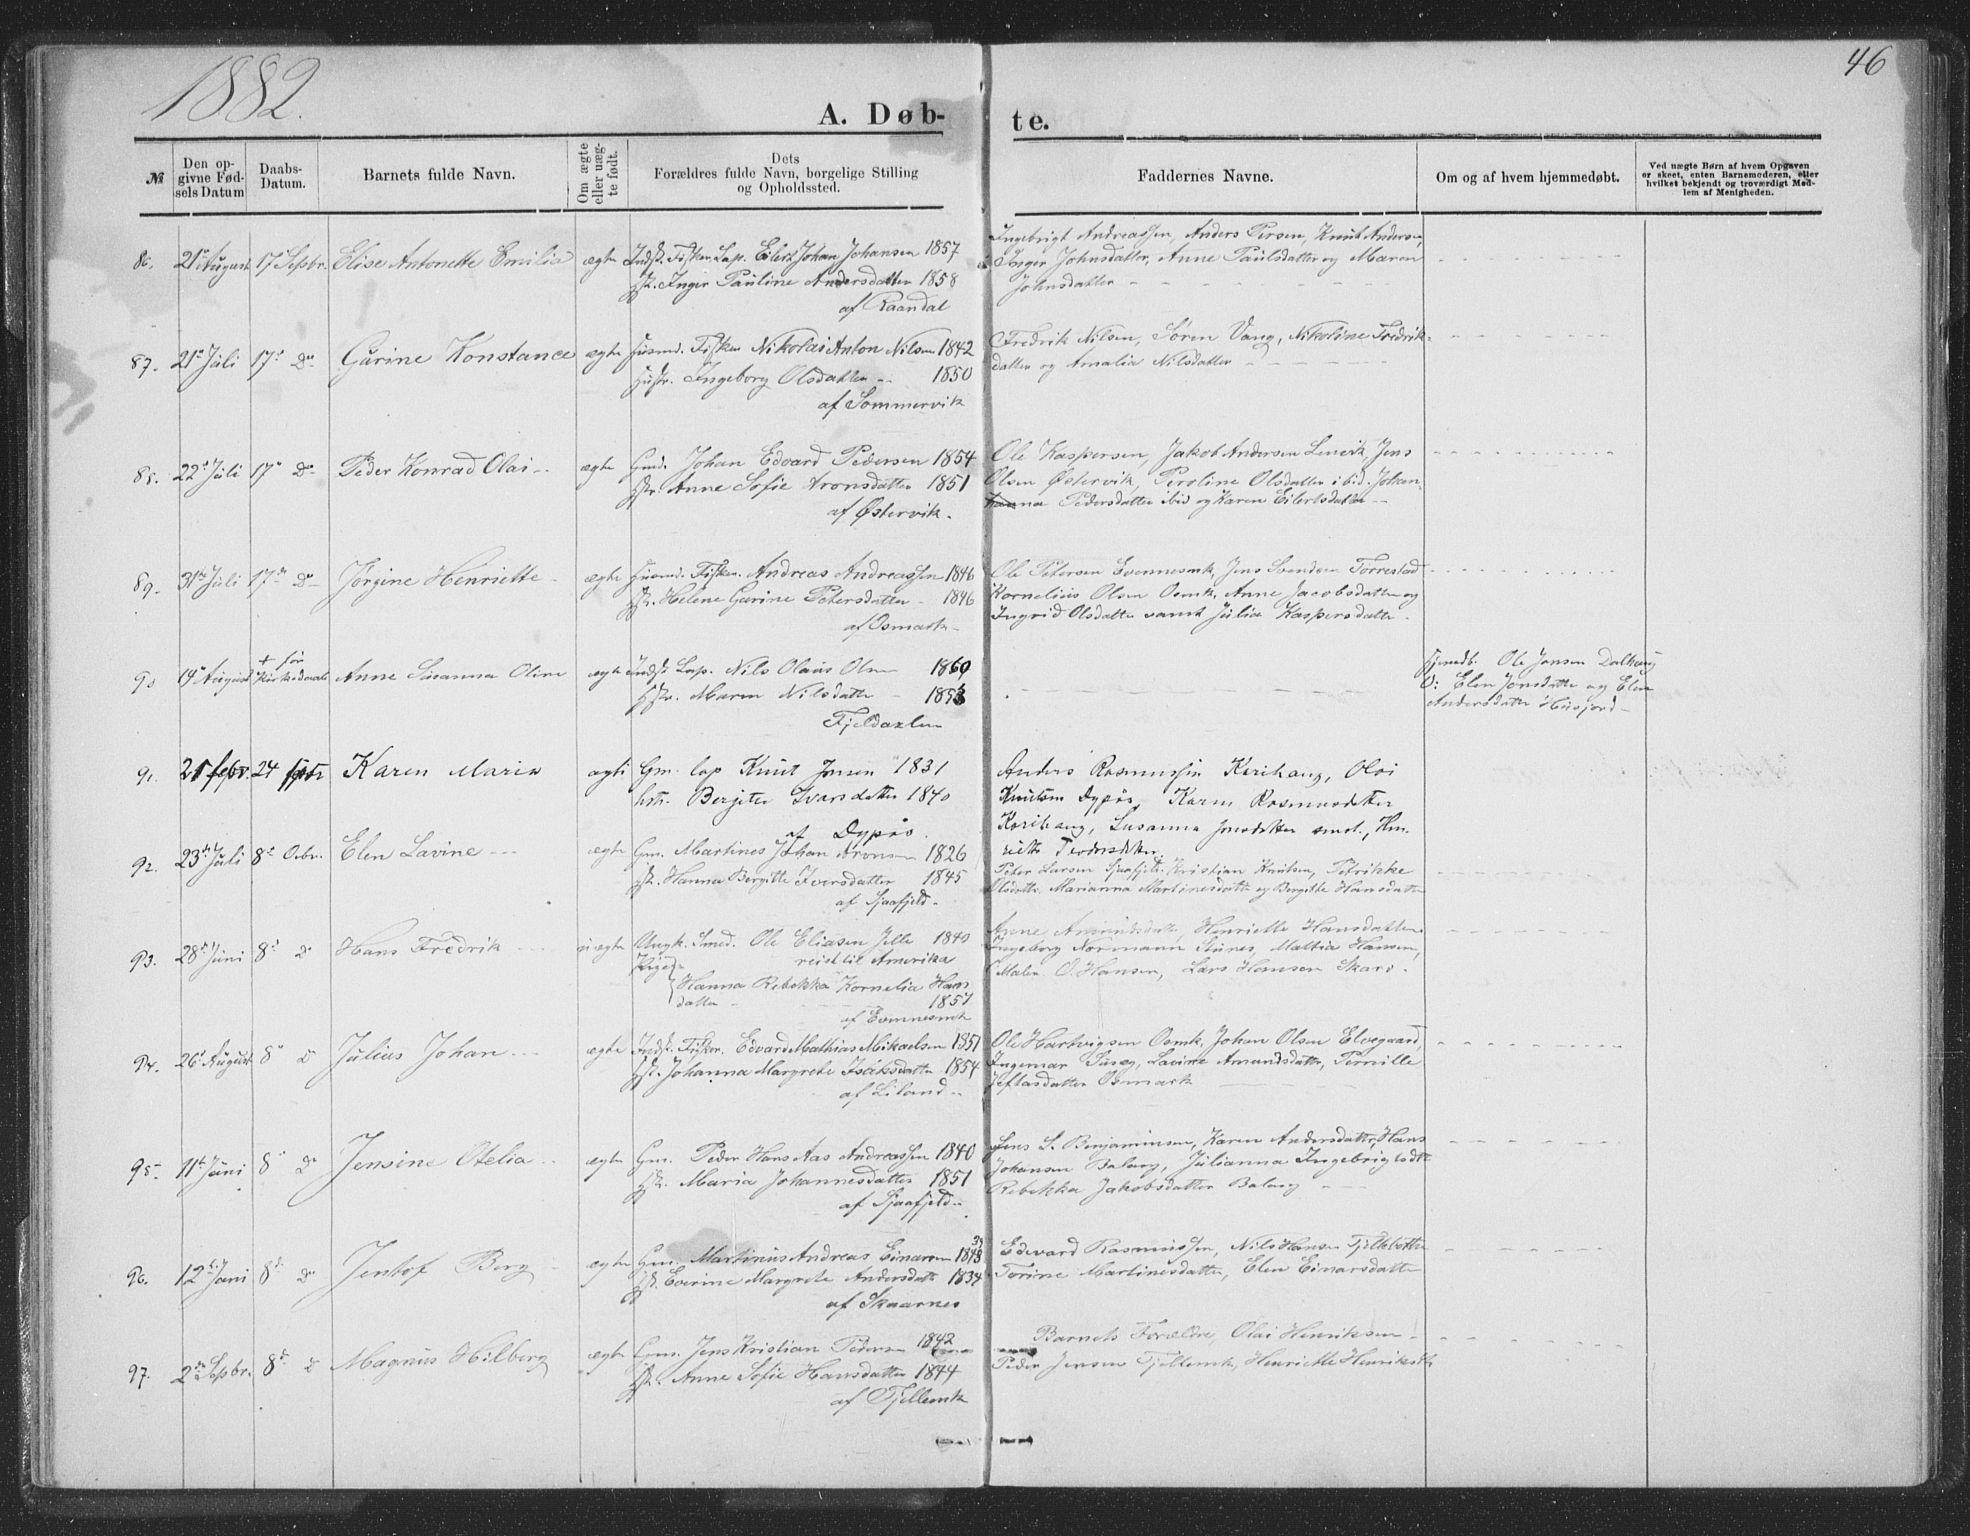 SAT, Ministerialprotokoller, klokkerbøker og fødselsregistre - Nordland, 863/L0913: Klokkerbok nr. 863C03, 1877-1885, s. 46